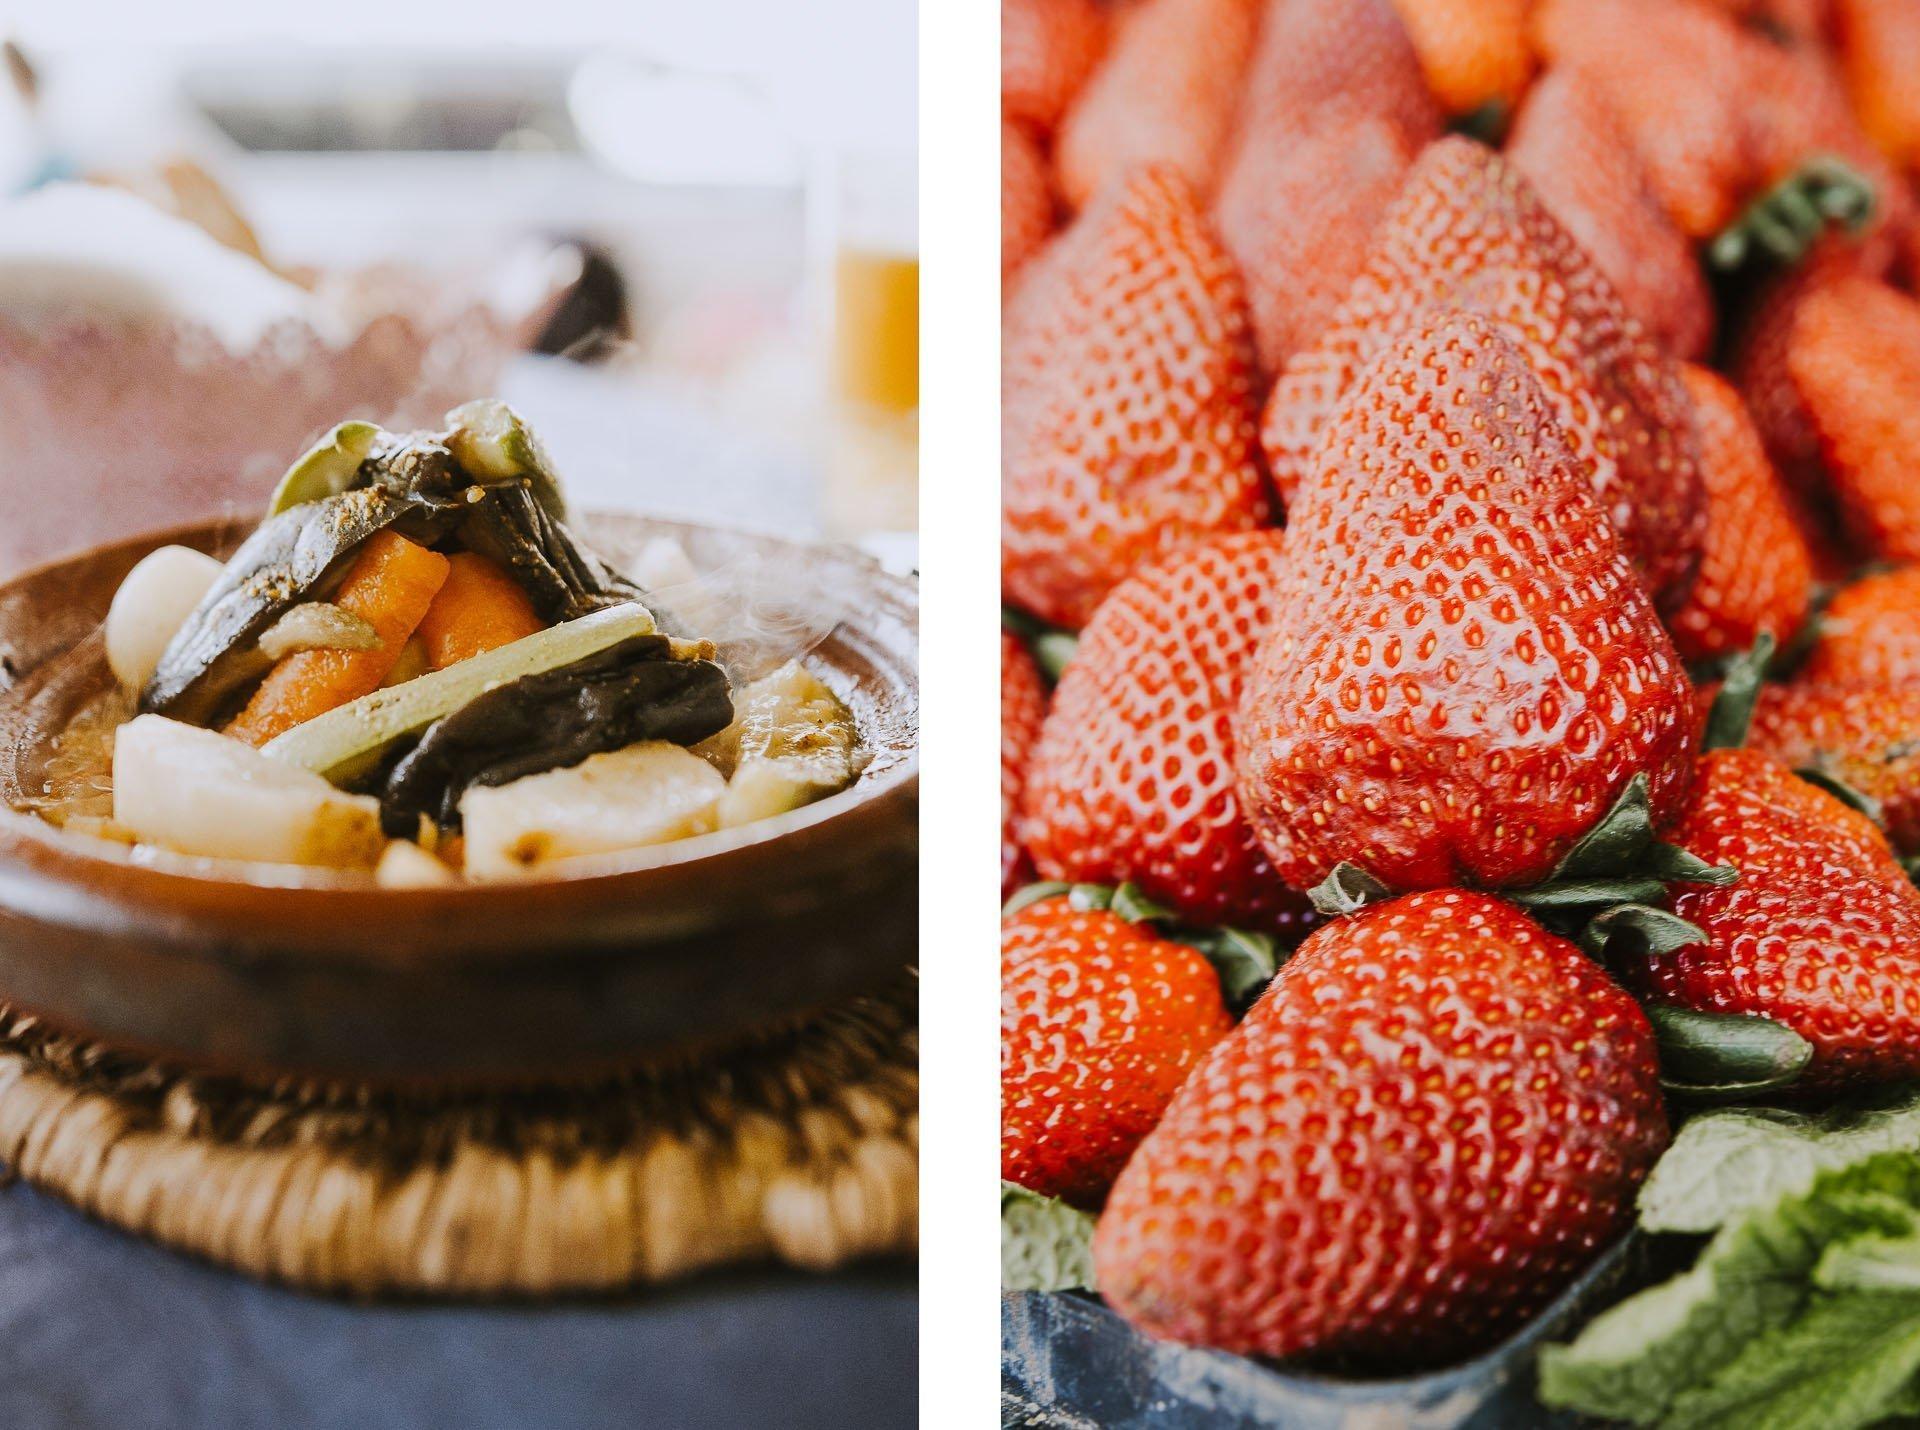 Martokańska kuchnia - Tradycyjny tadżin